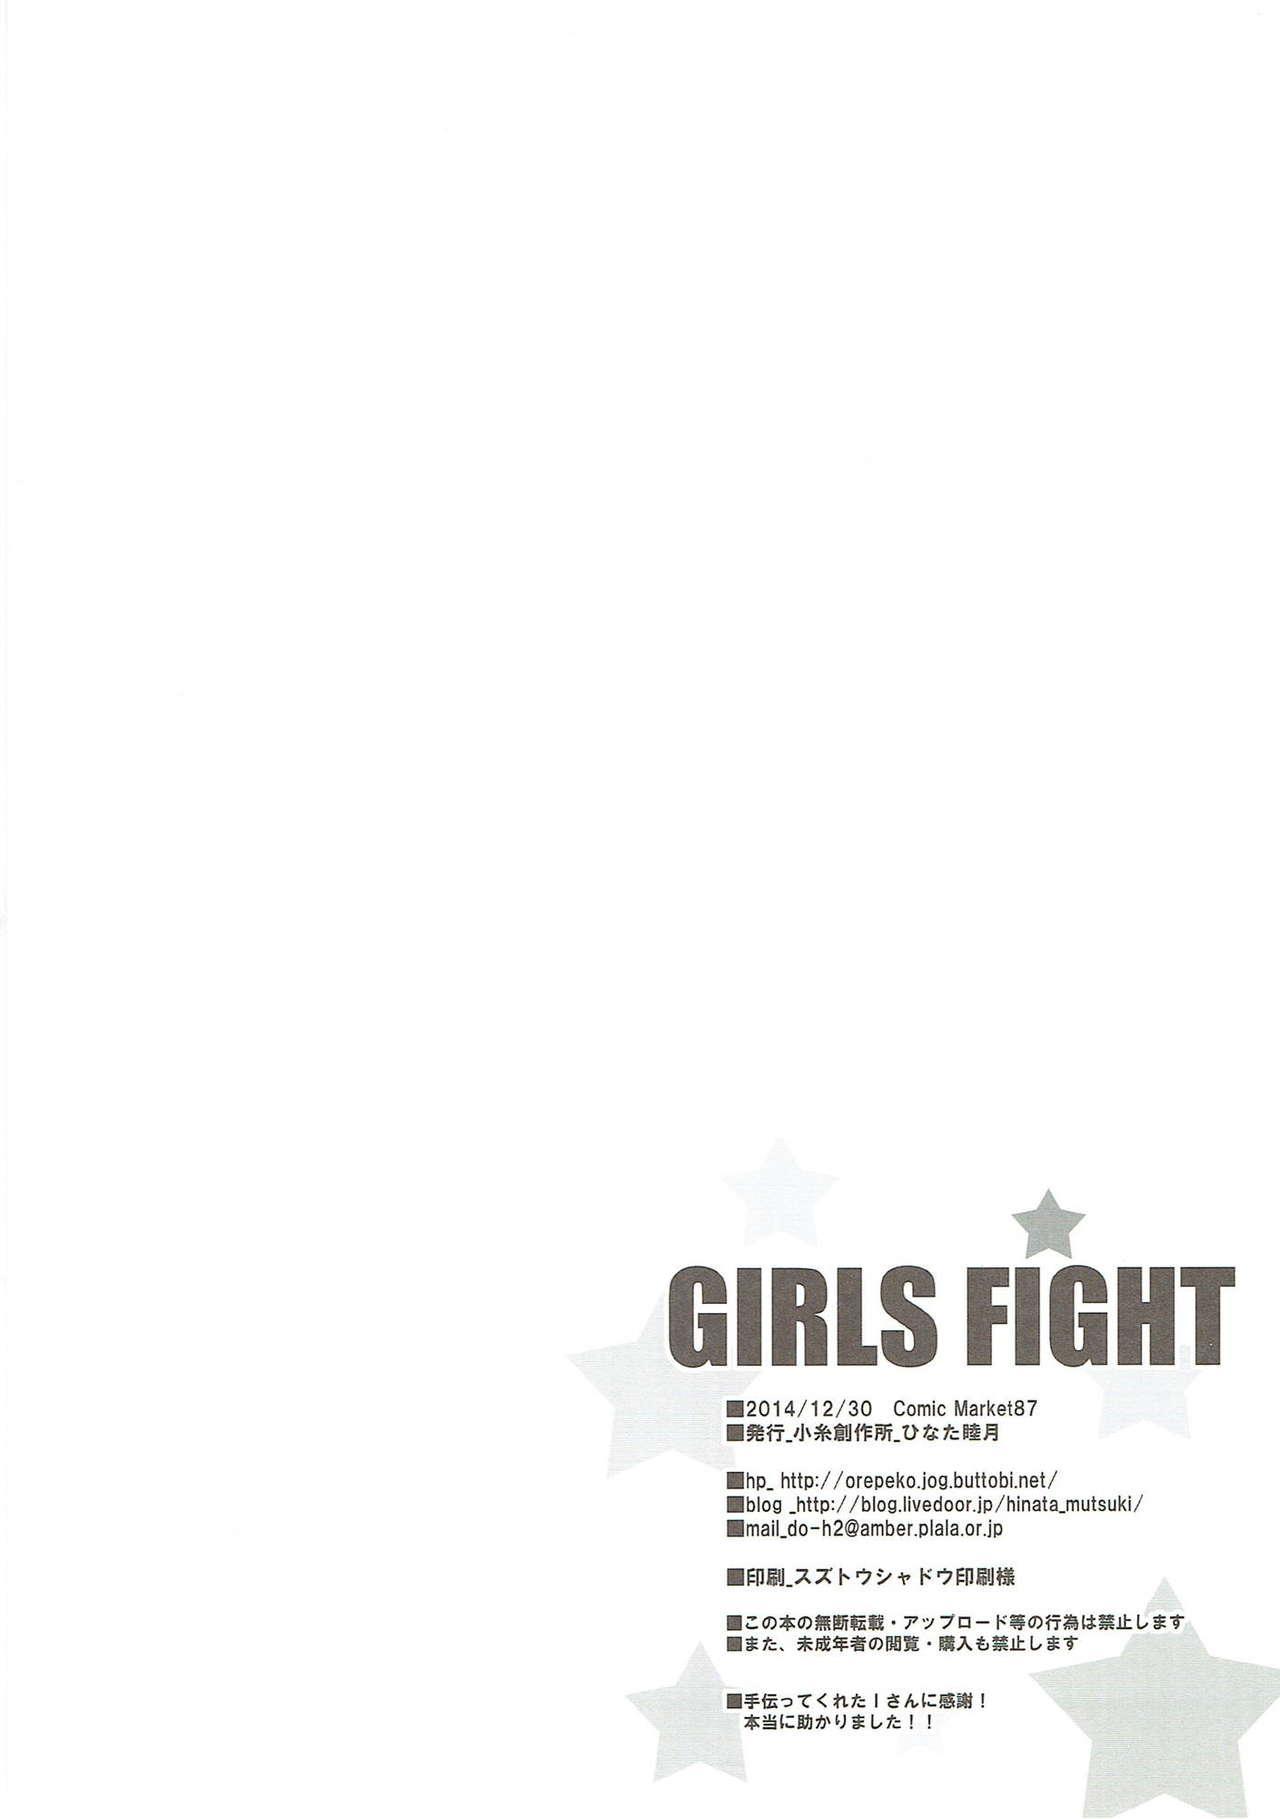 GIRLS FIGHT 20